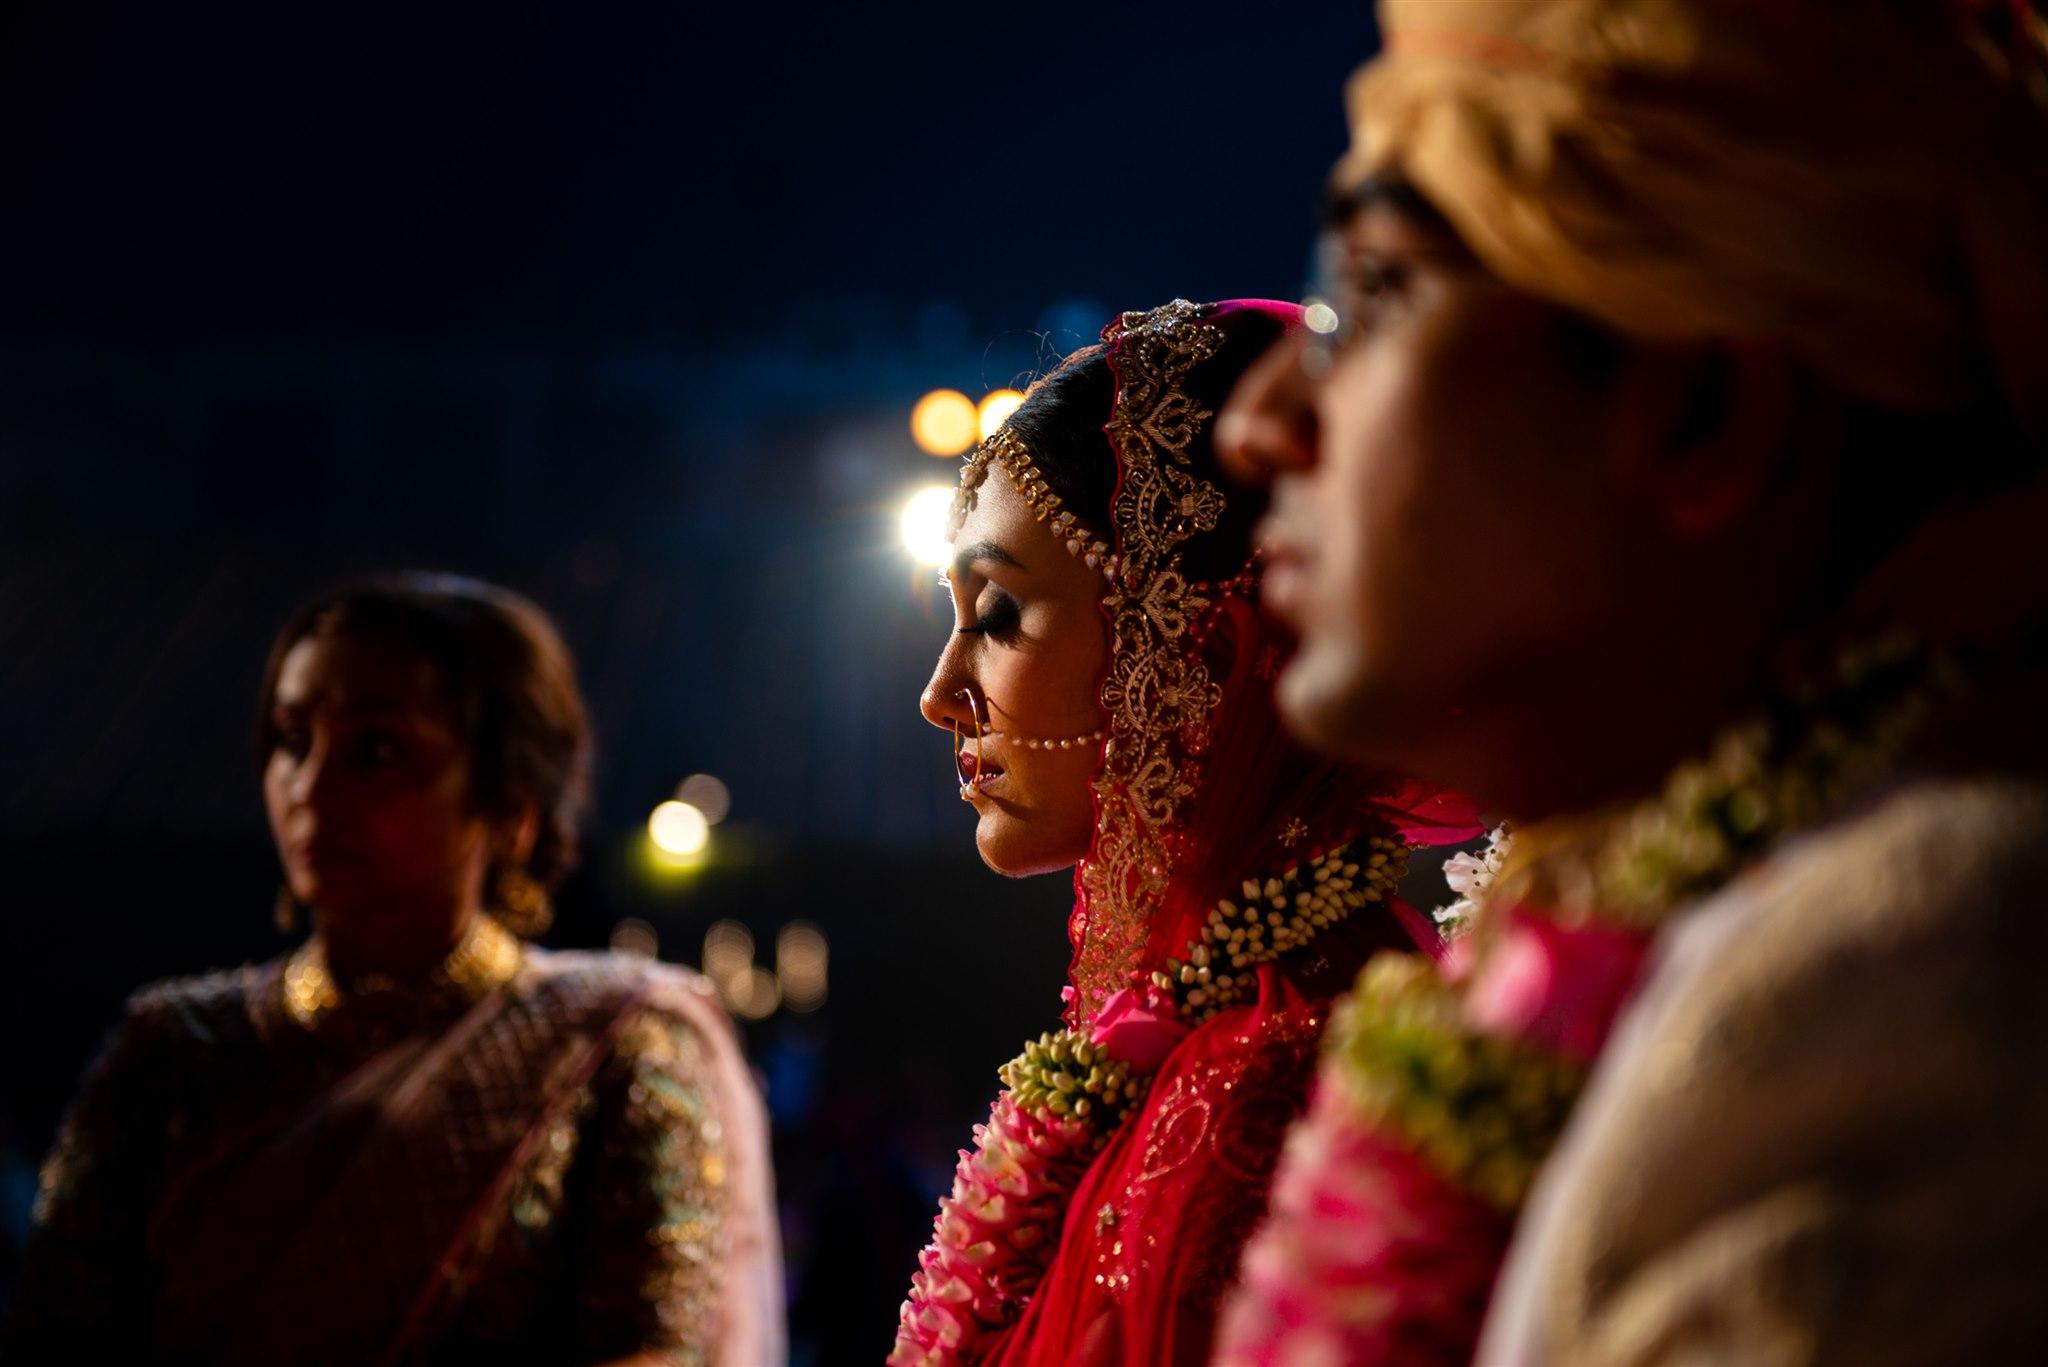 narracia-wygledacz-photographe-mariage-portfolio-07.jpg